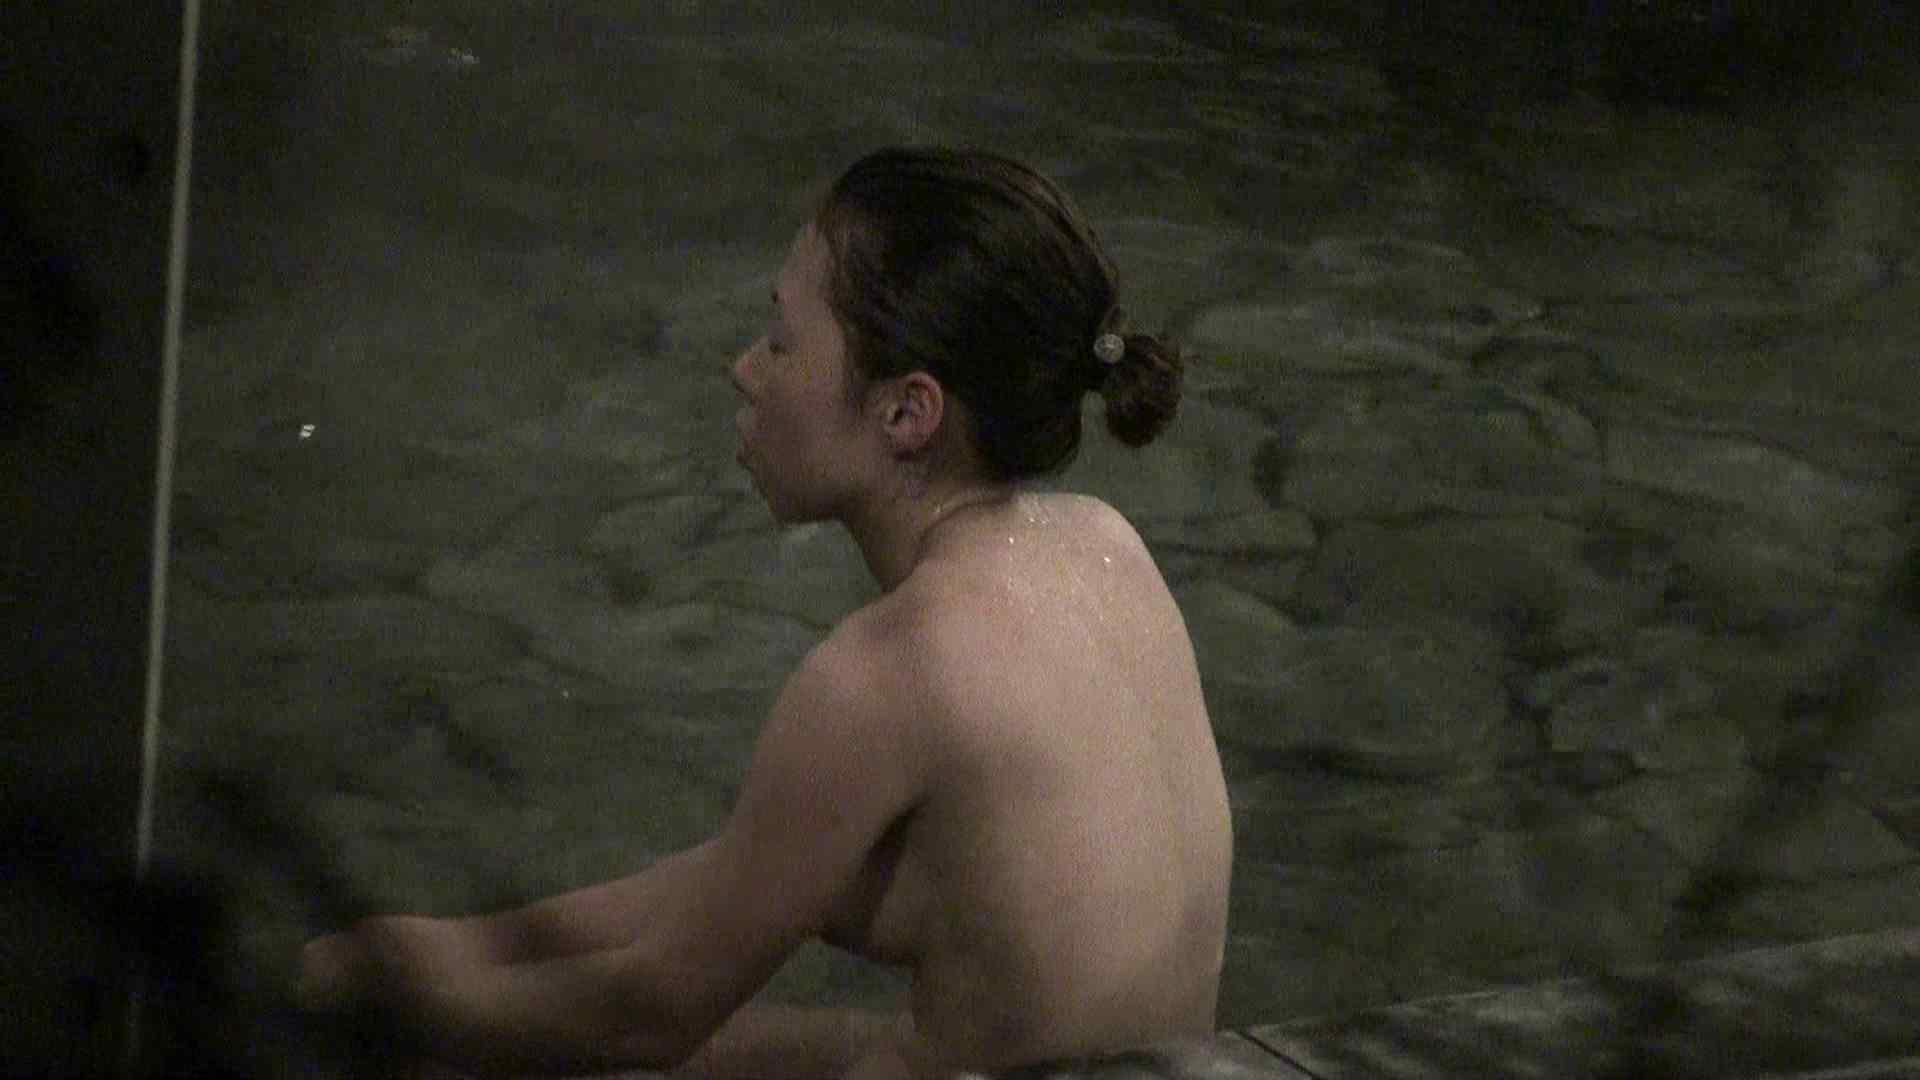 Aquaな露天風呂Vol.391 綺麗なOLたち  52枚 42